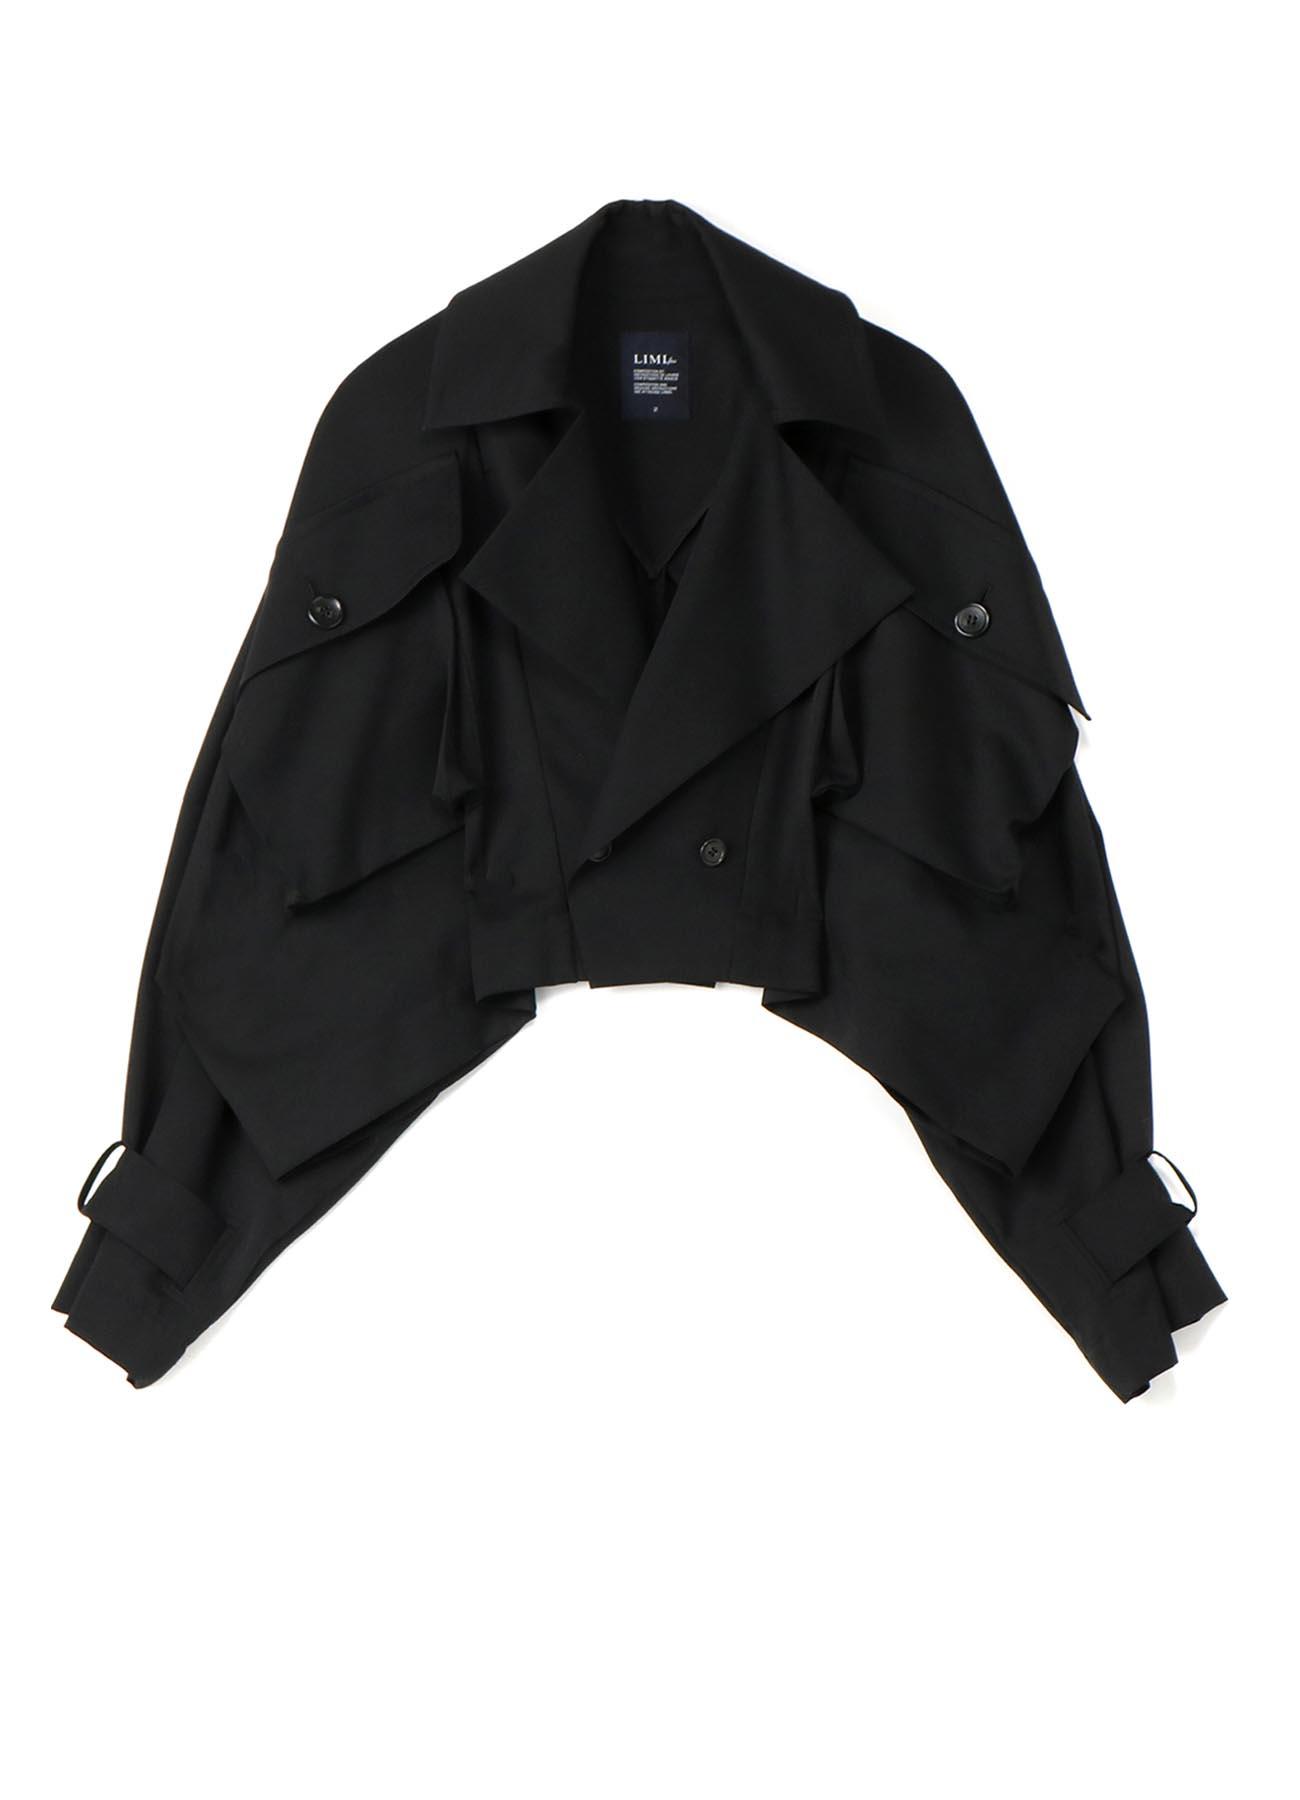 W/Gabardine Square Big Pocket jacket